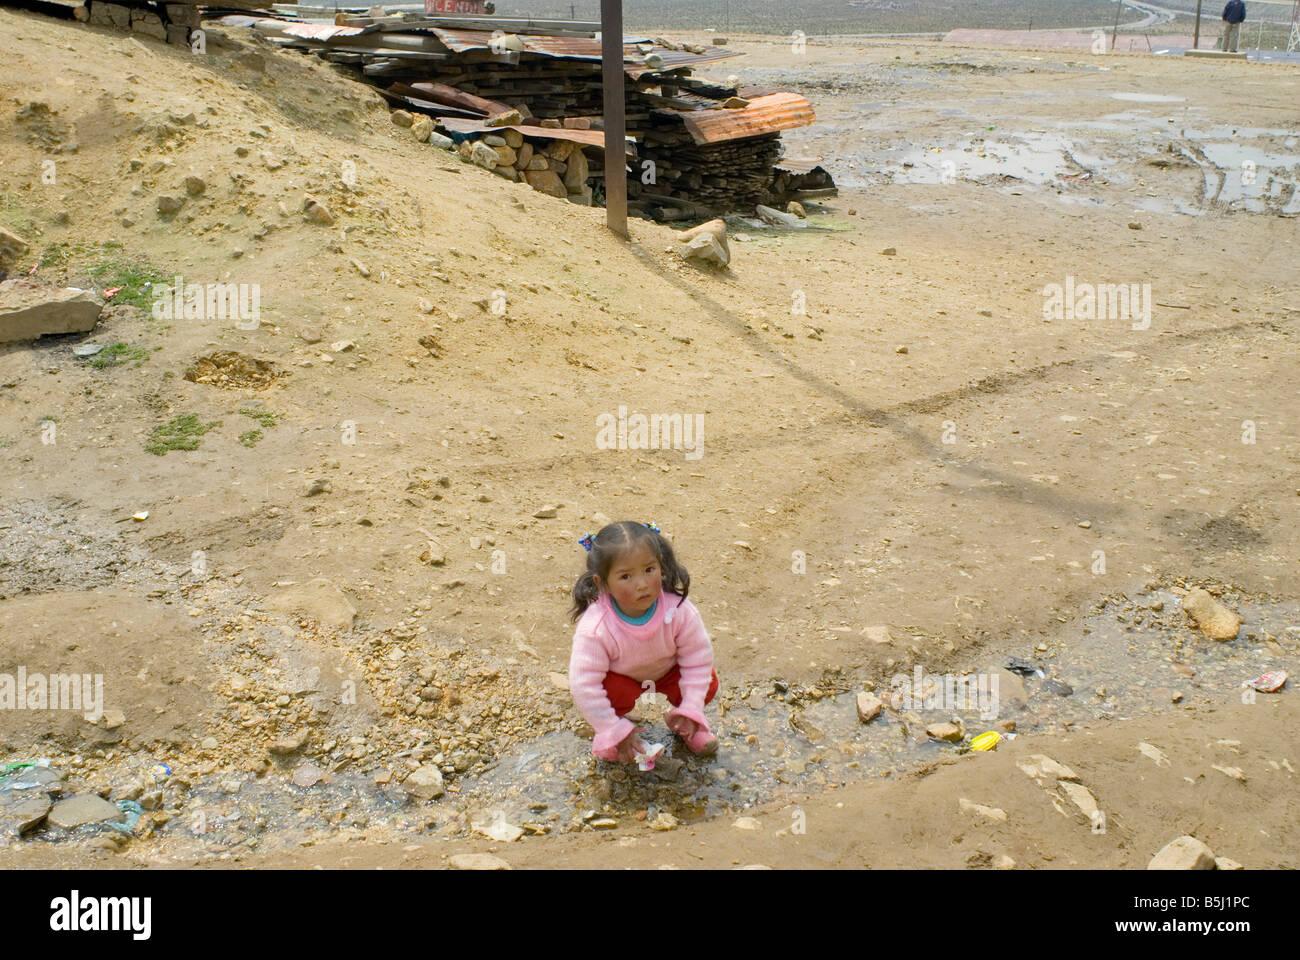 Szene in der Kleinstadt Morococho Peru Stockbild